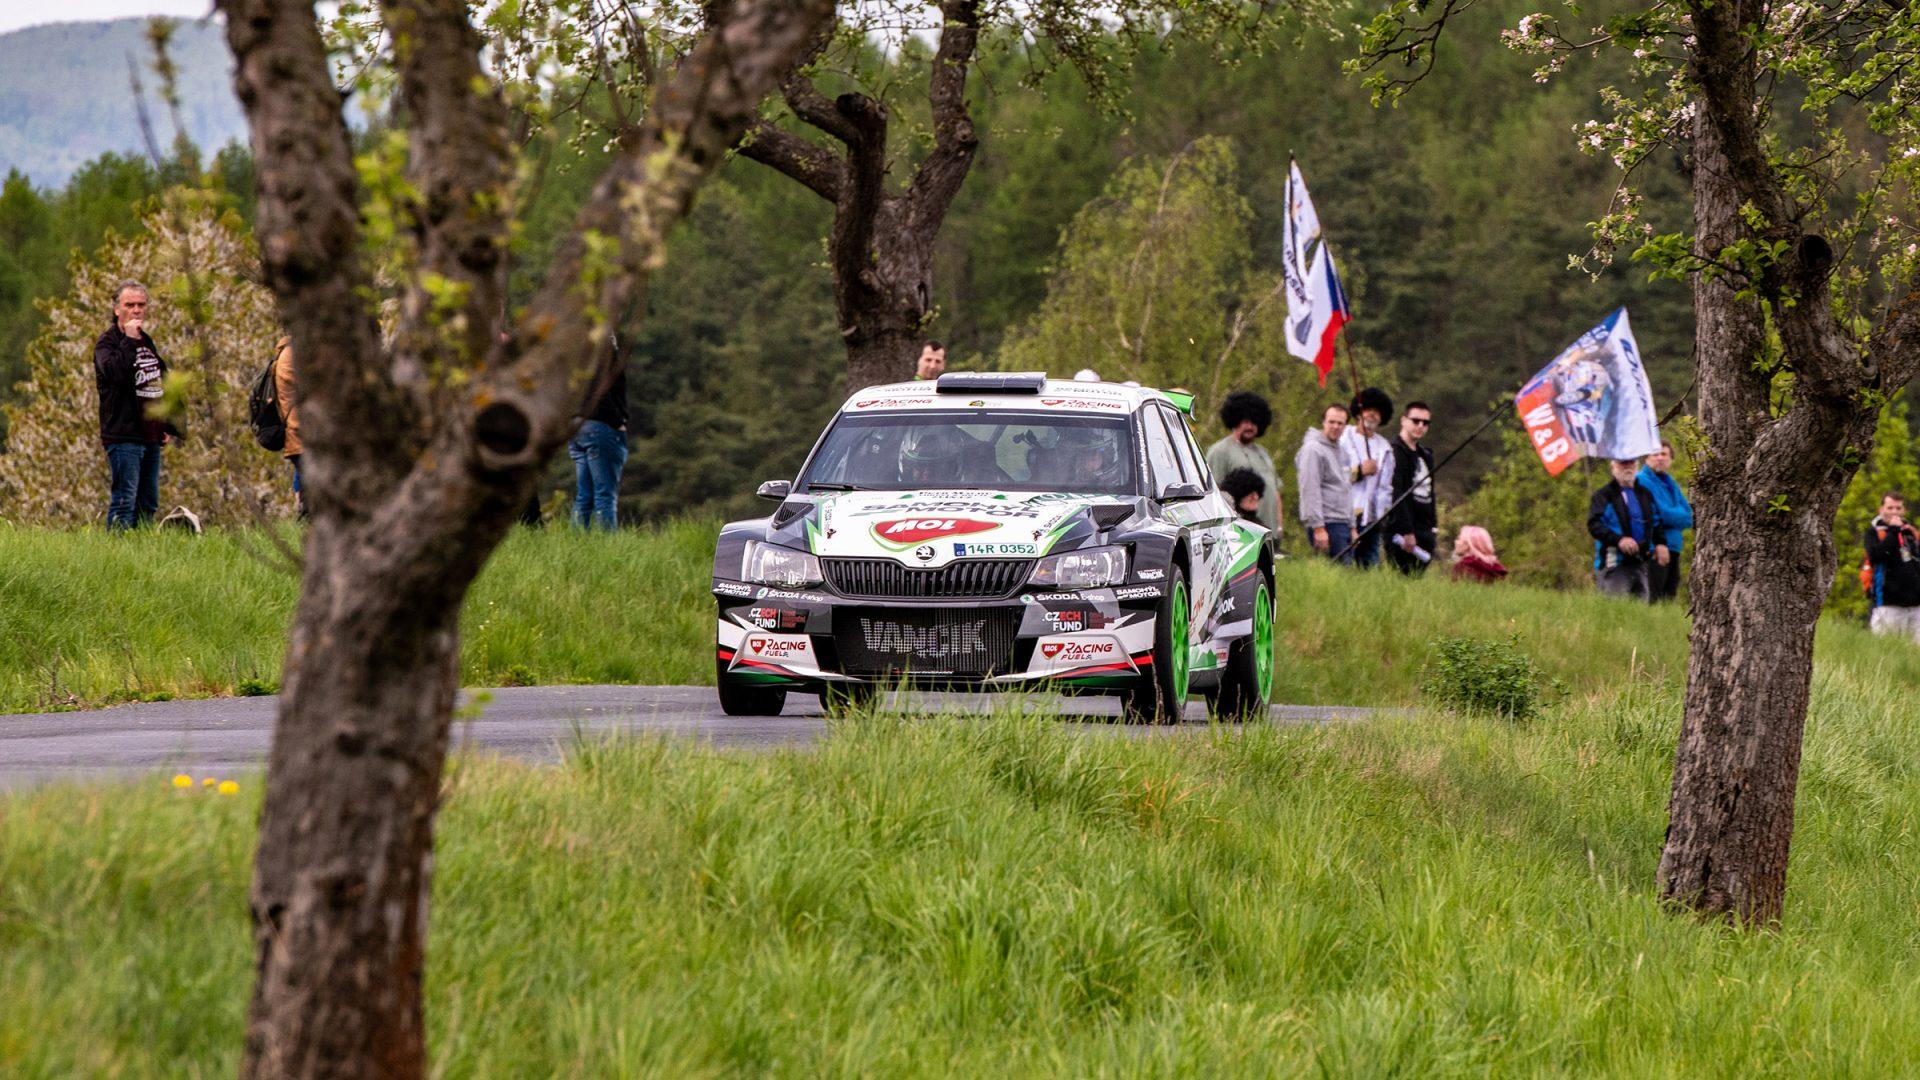 Rallye Šumava Klatovy is Back in the Czech Rally Championship Calendar